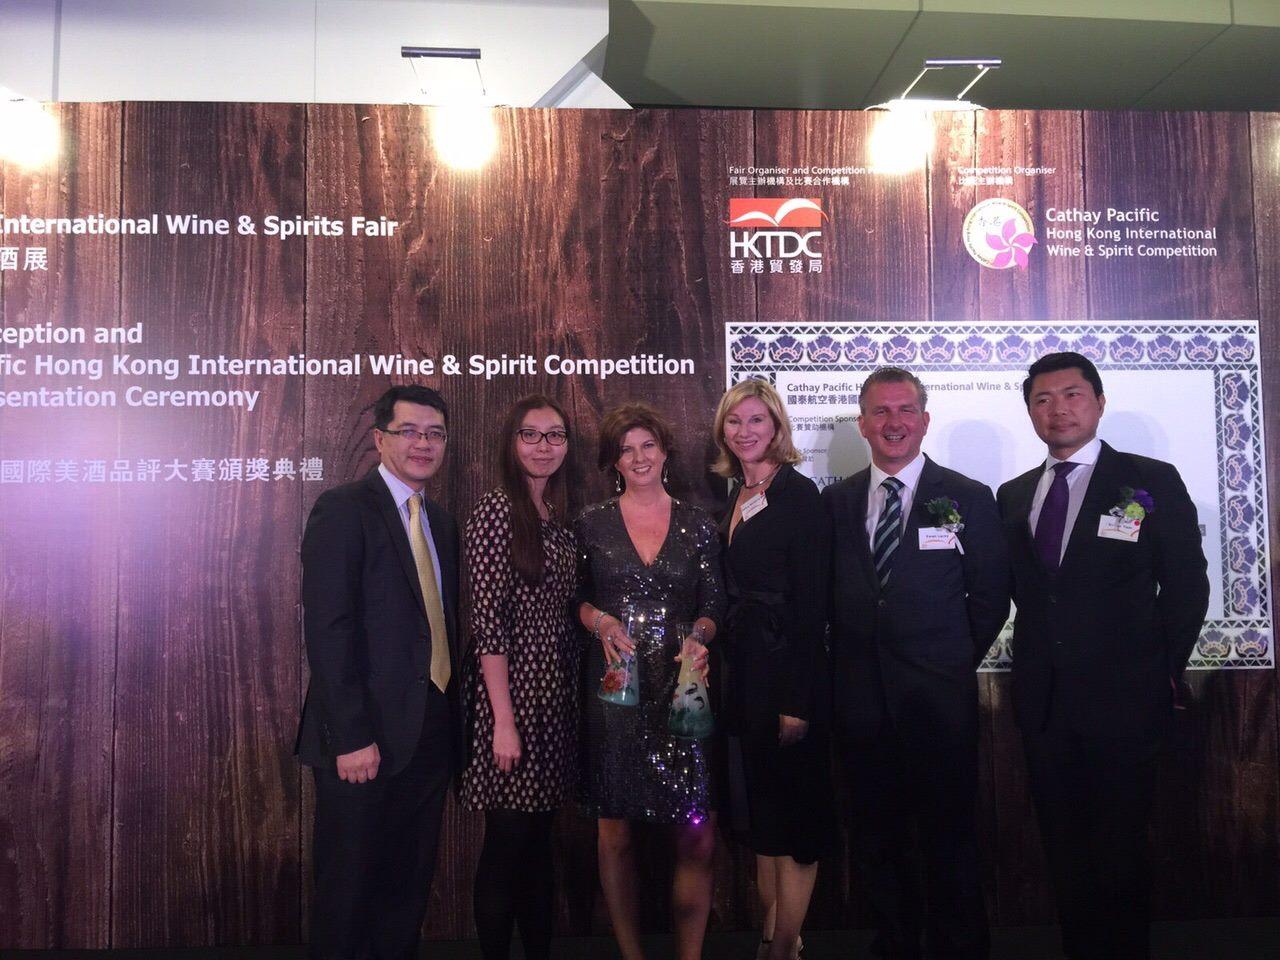 Cathay Pacific HK IWSC Awards Ceremony - Nov 2015